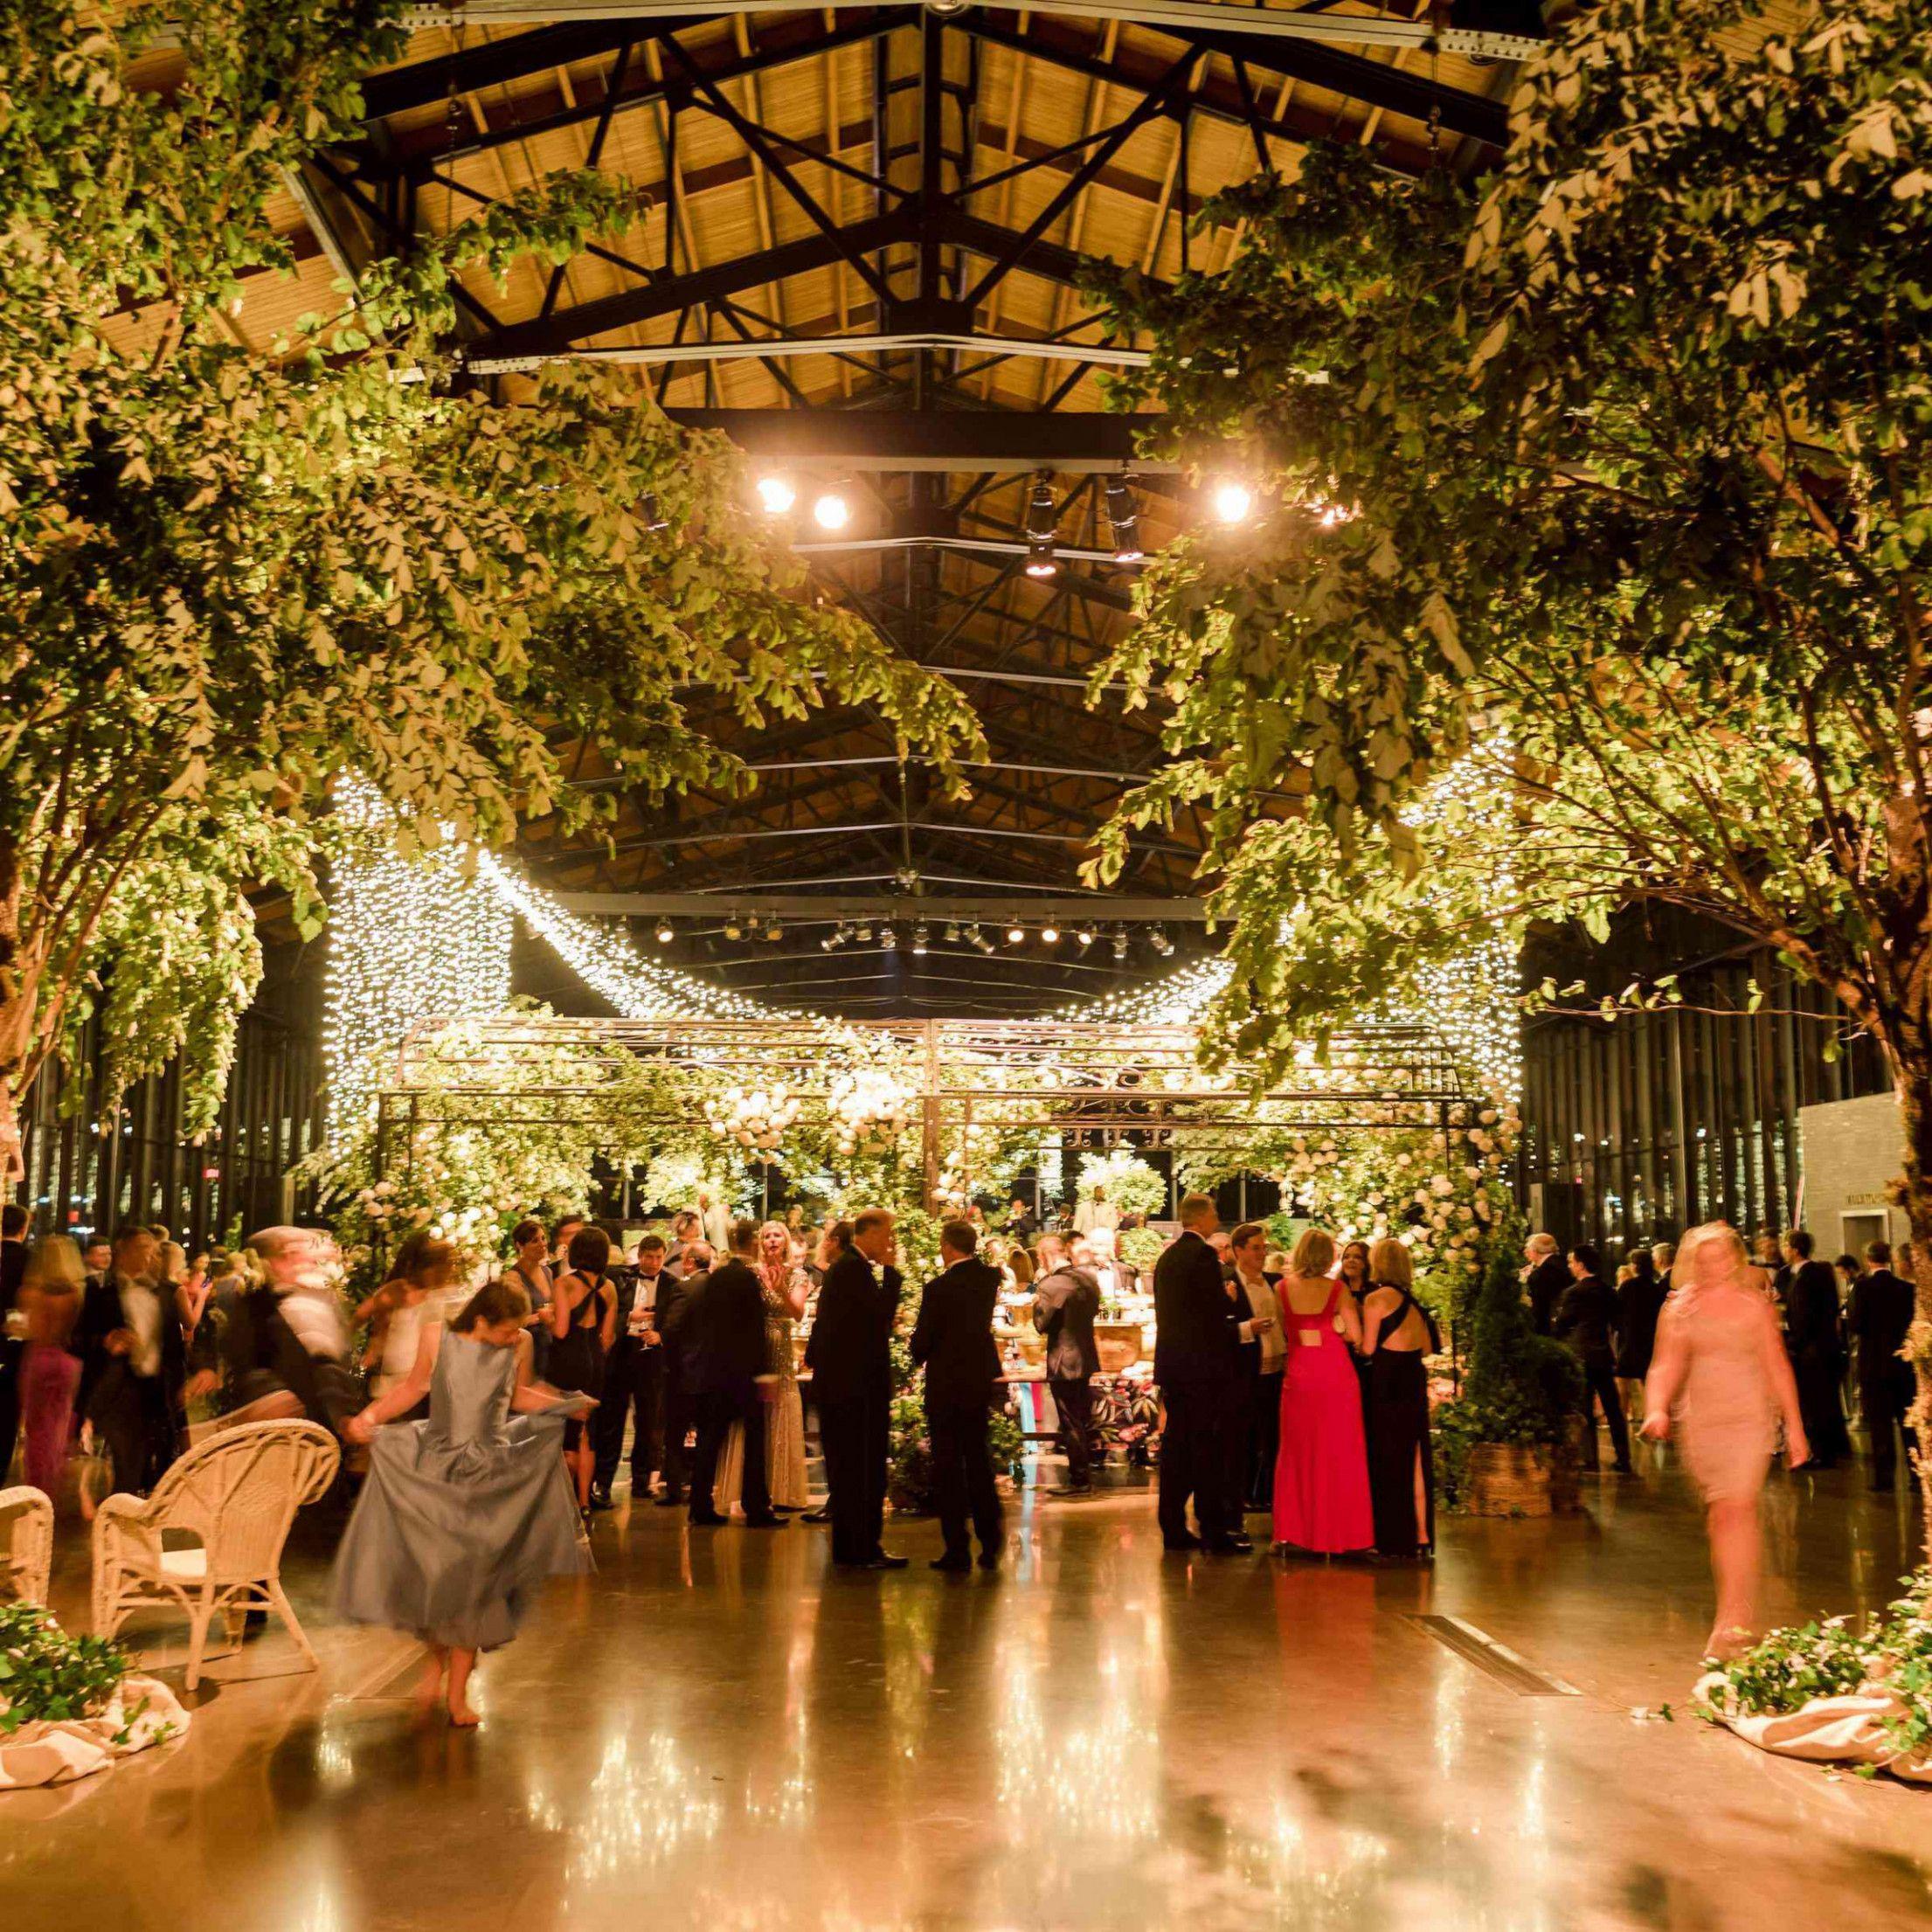 Seven Ingenious Ways You Can Do With Cheap Small Weddings Tempat Pernikahan Dekorasi Perkawinan